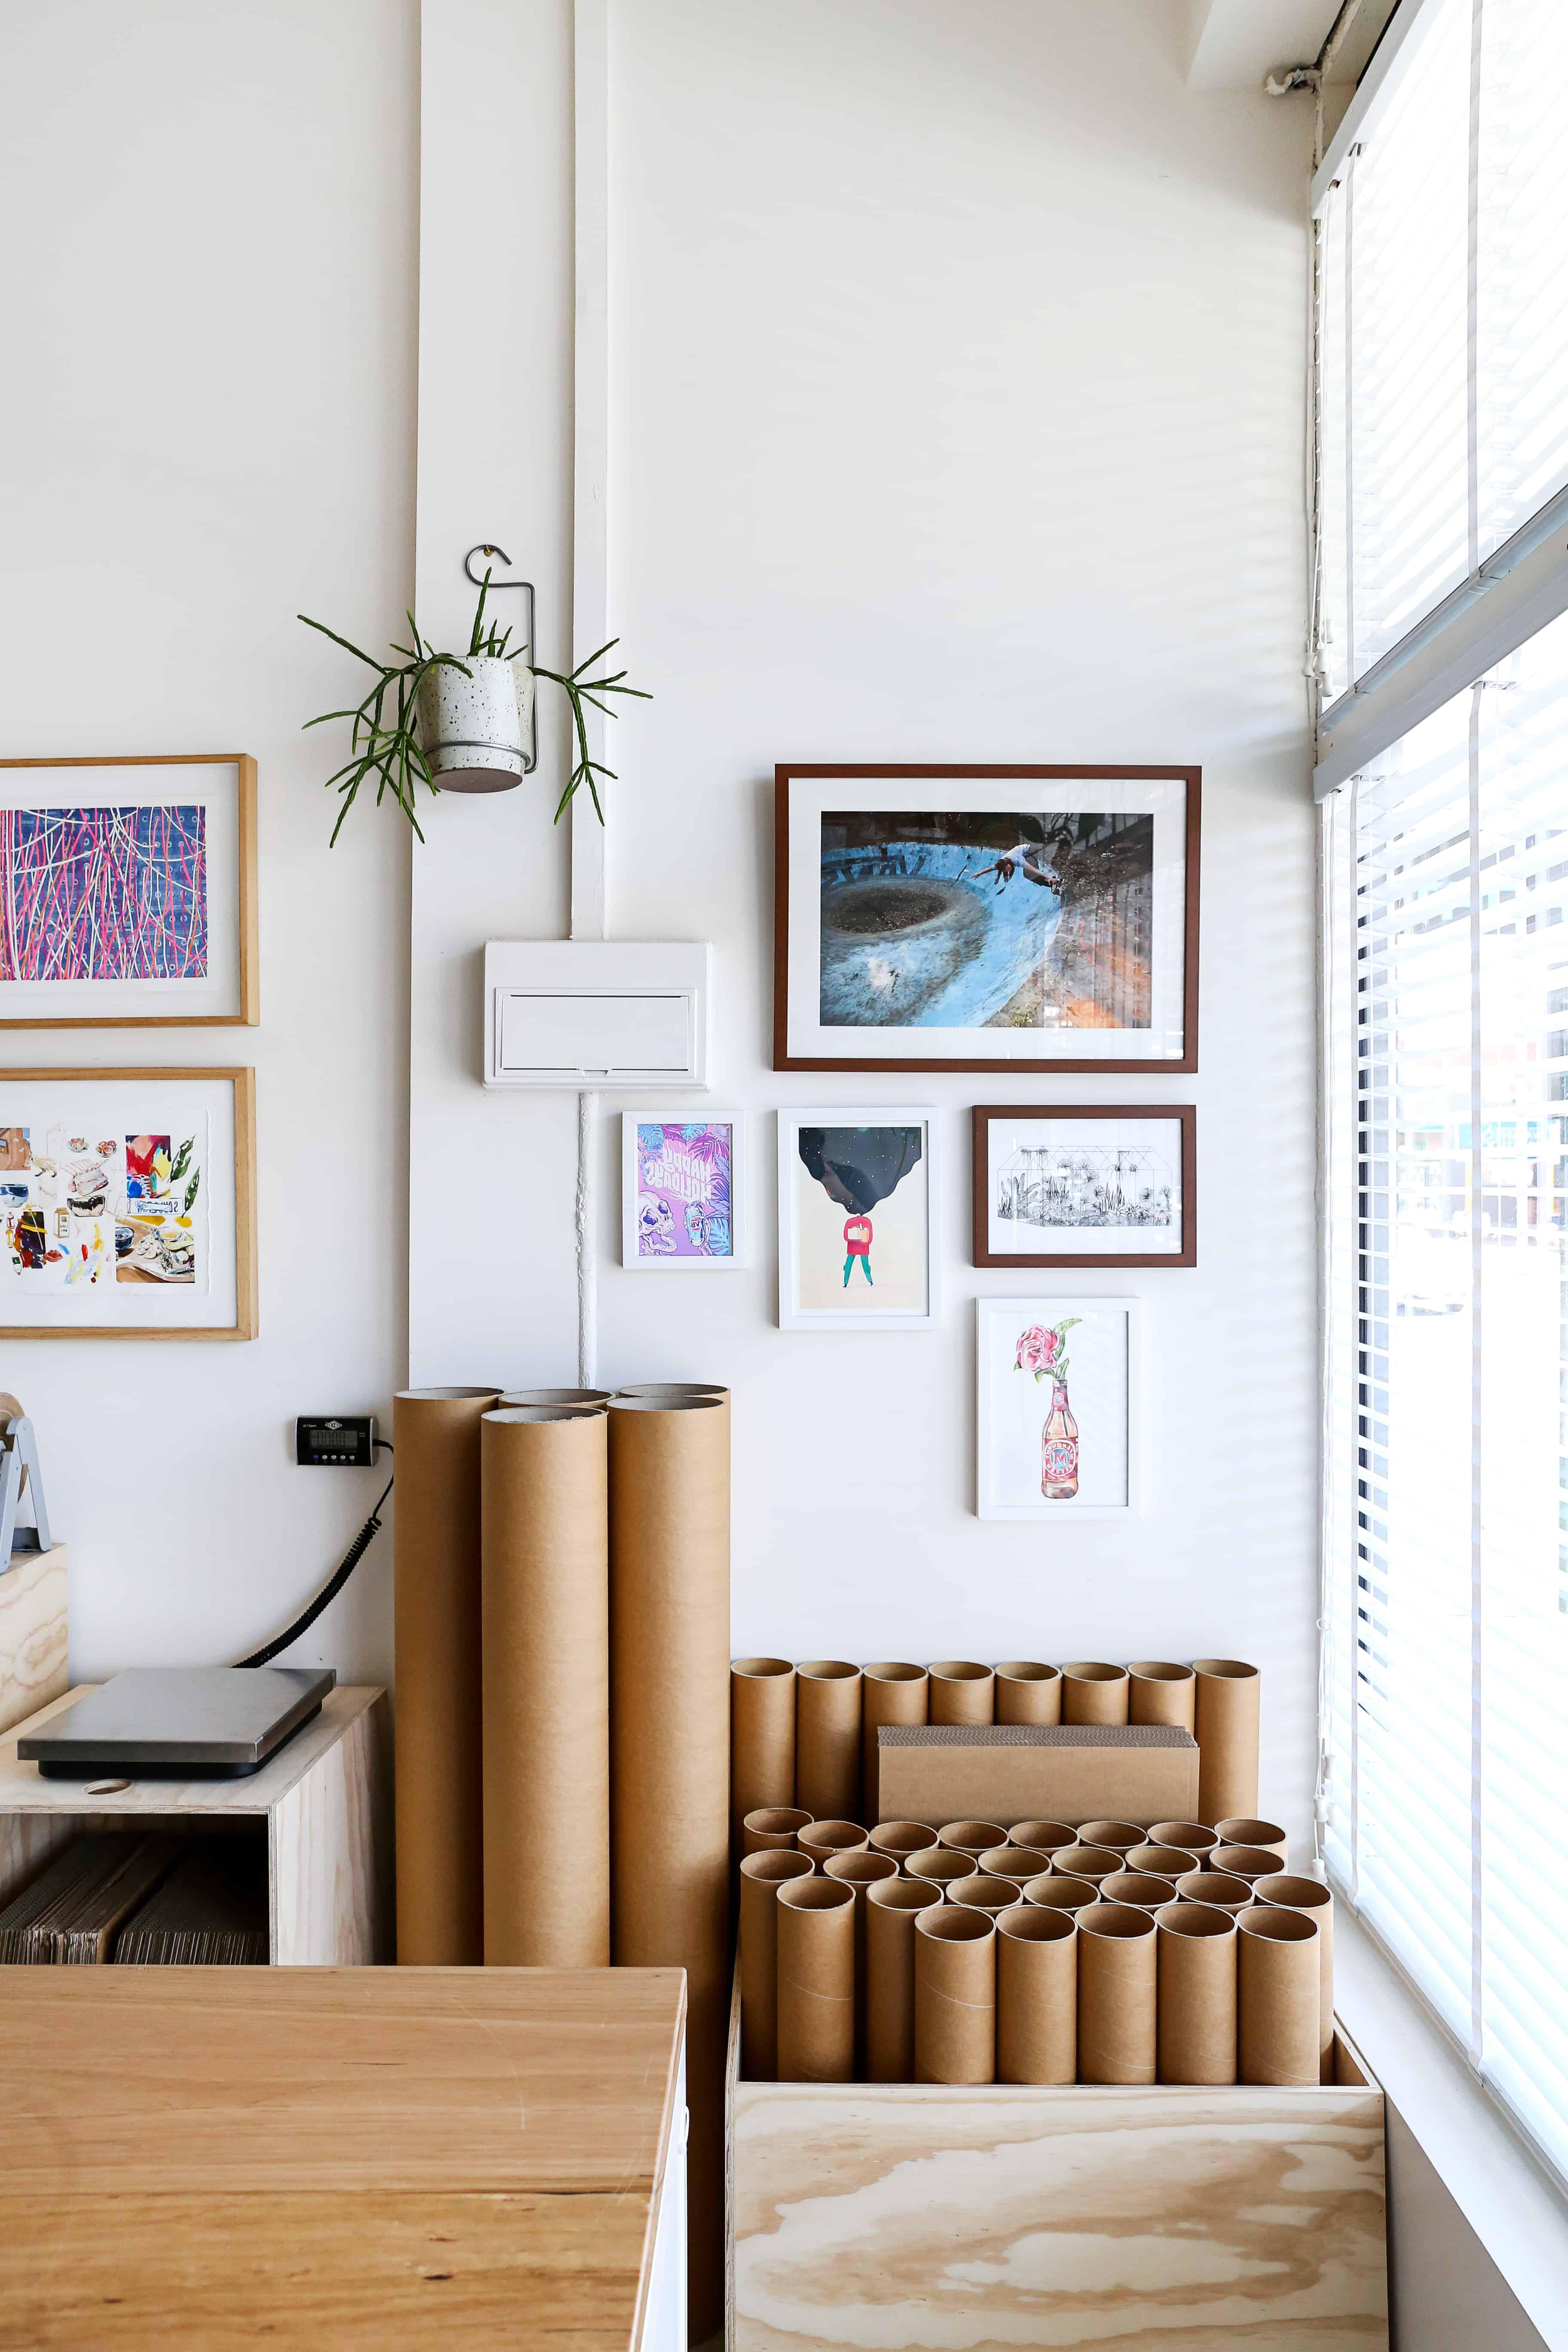 Studio space image